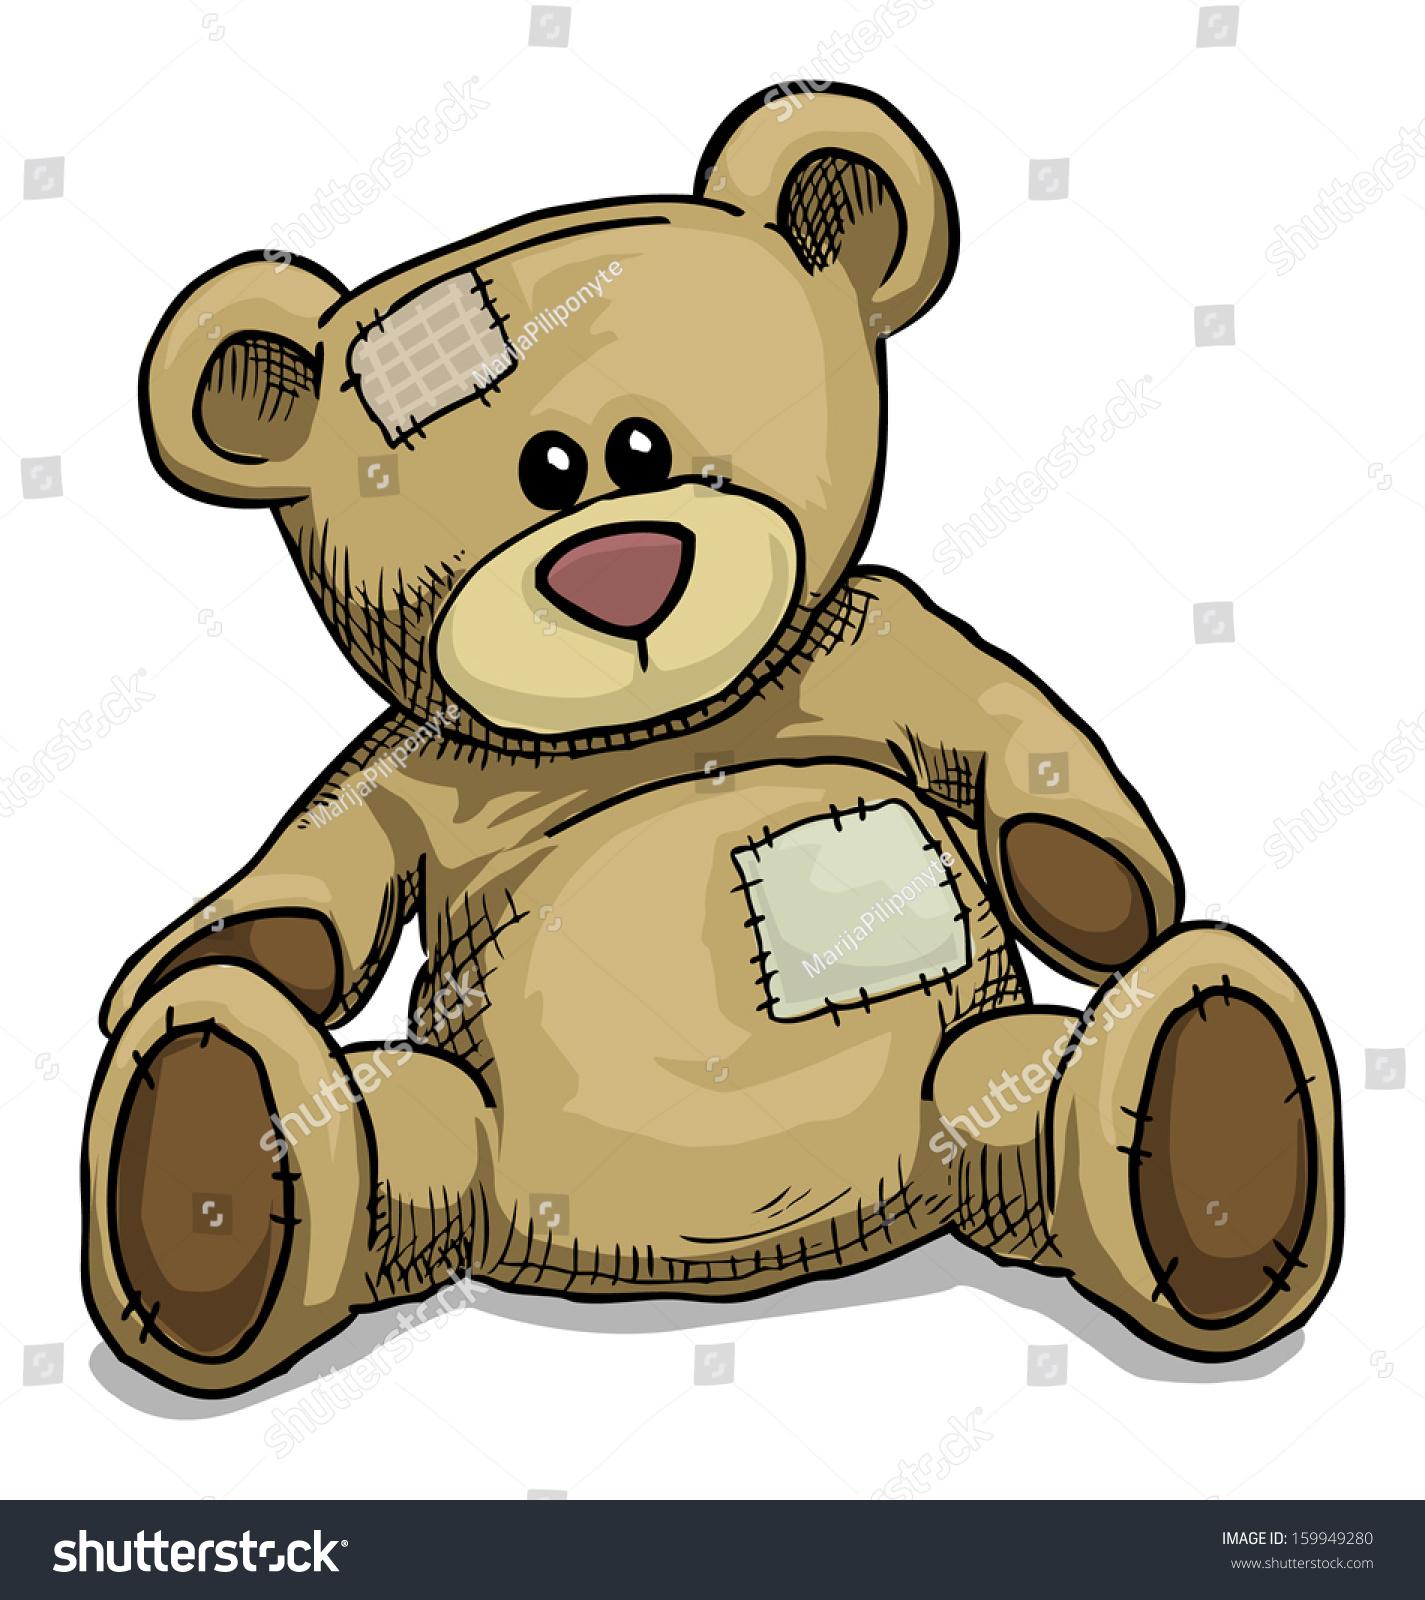 Hand Drawn Teddy Bear Isolated On White Vector